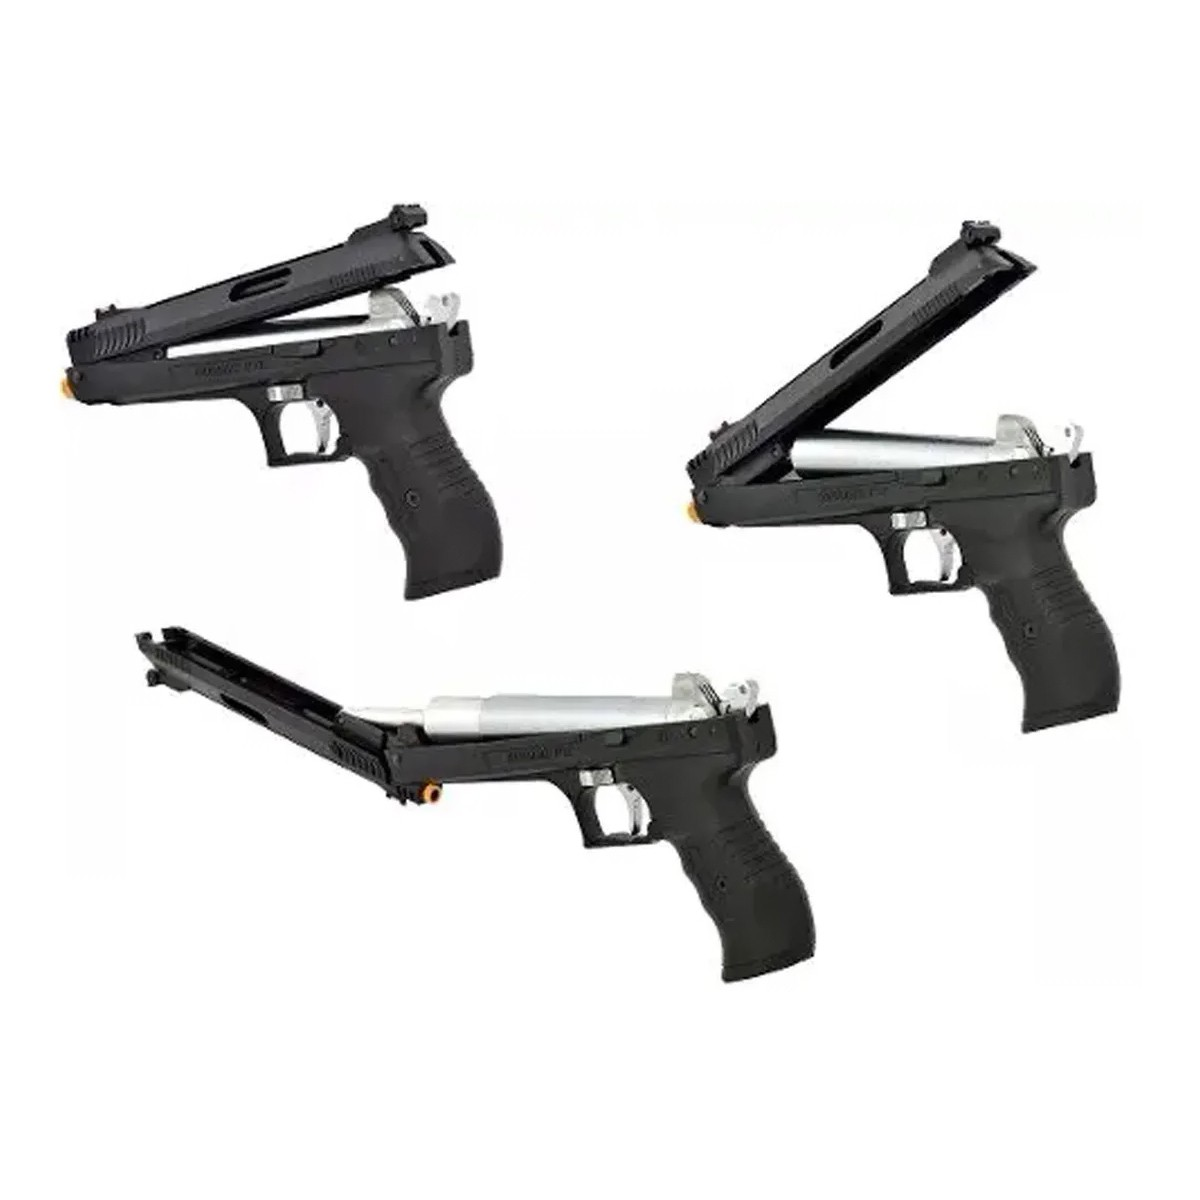 Pistola de Pressão Chumbinho Beeman 2004 Airgun 4.5mm + 3 Pack de chumbinho 4.5mm + Porta chumbinho